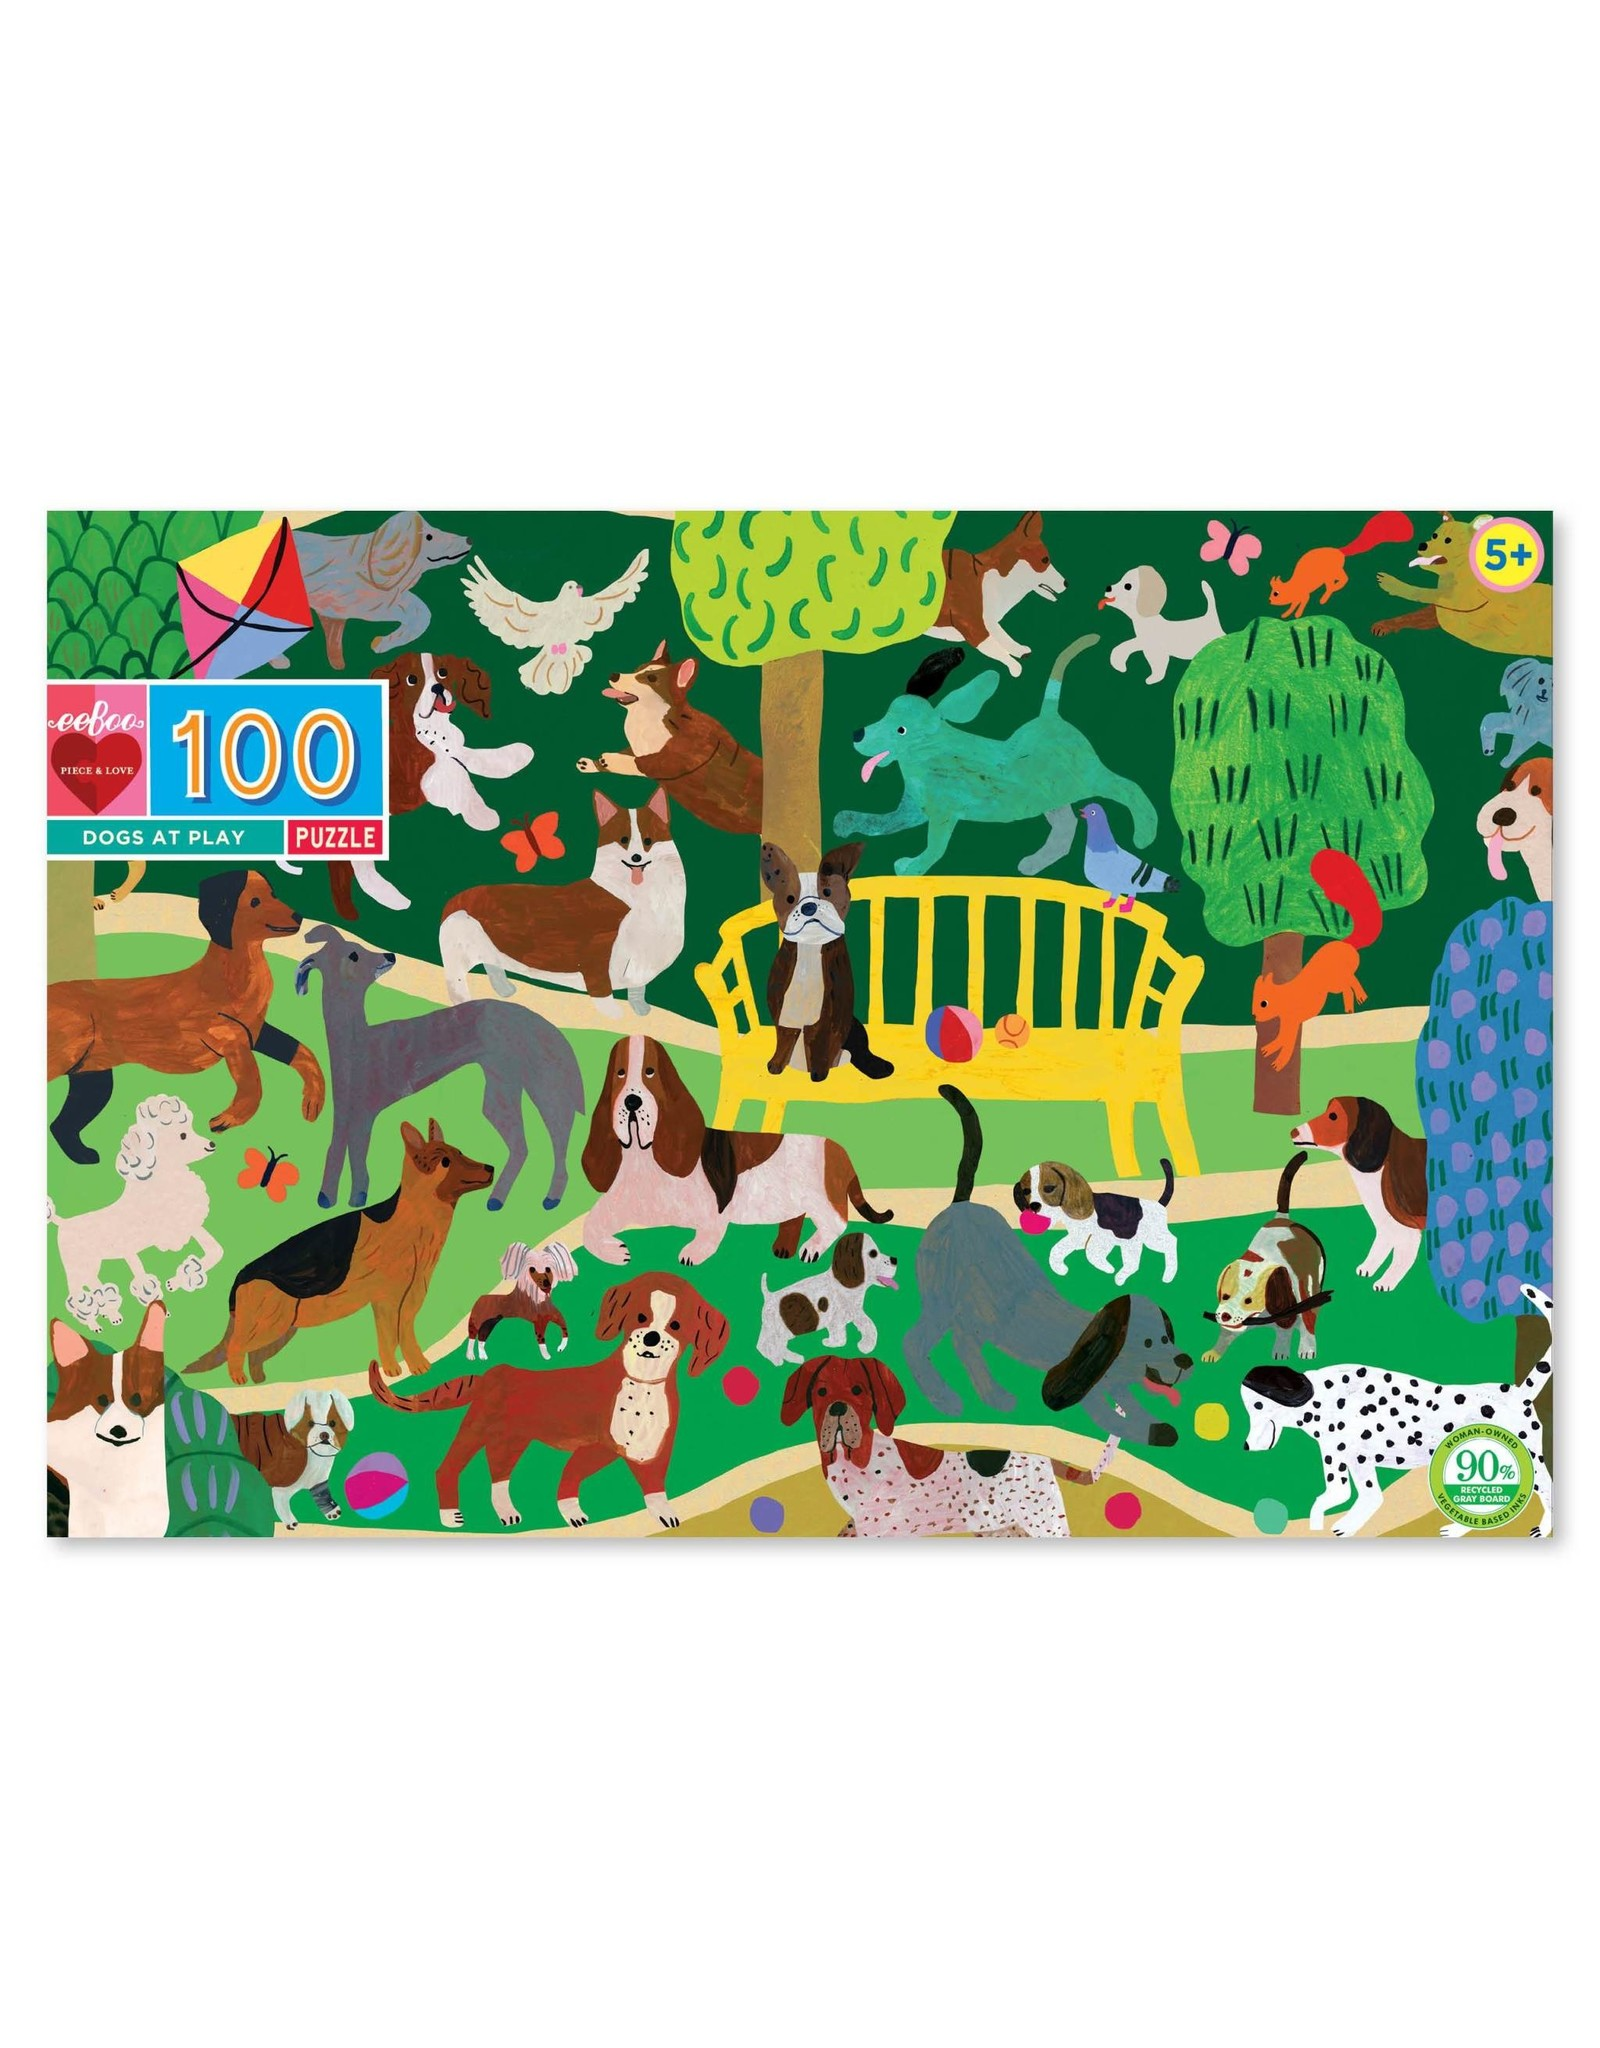 eeBoo Dogs at Play 100p